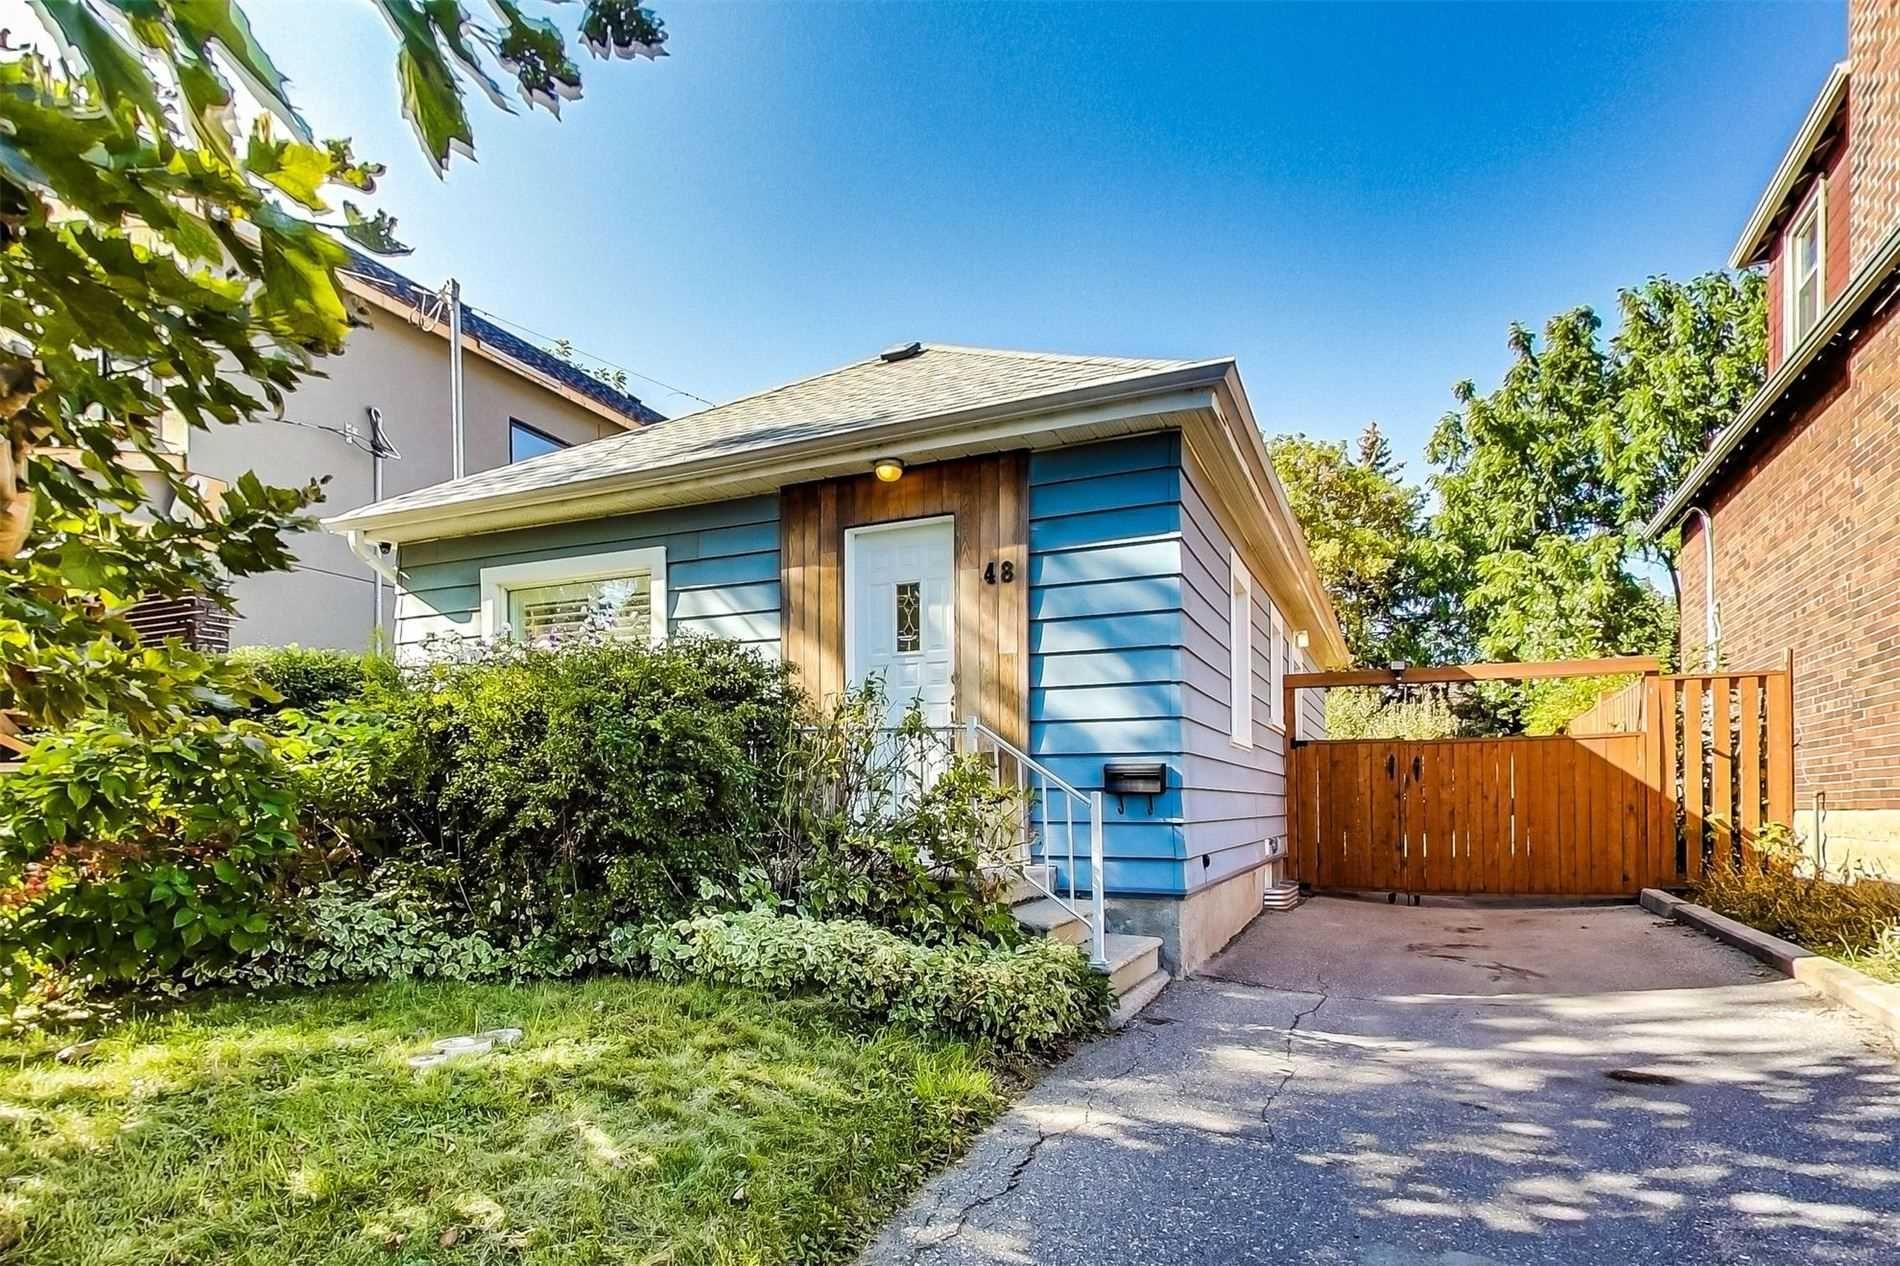 Main Photo: 48 Elma Street in Toronto: Mimico House (Bungalow) for sale (Toronto W06)  : MLS®# W4585828